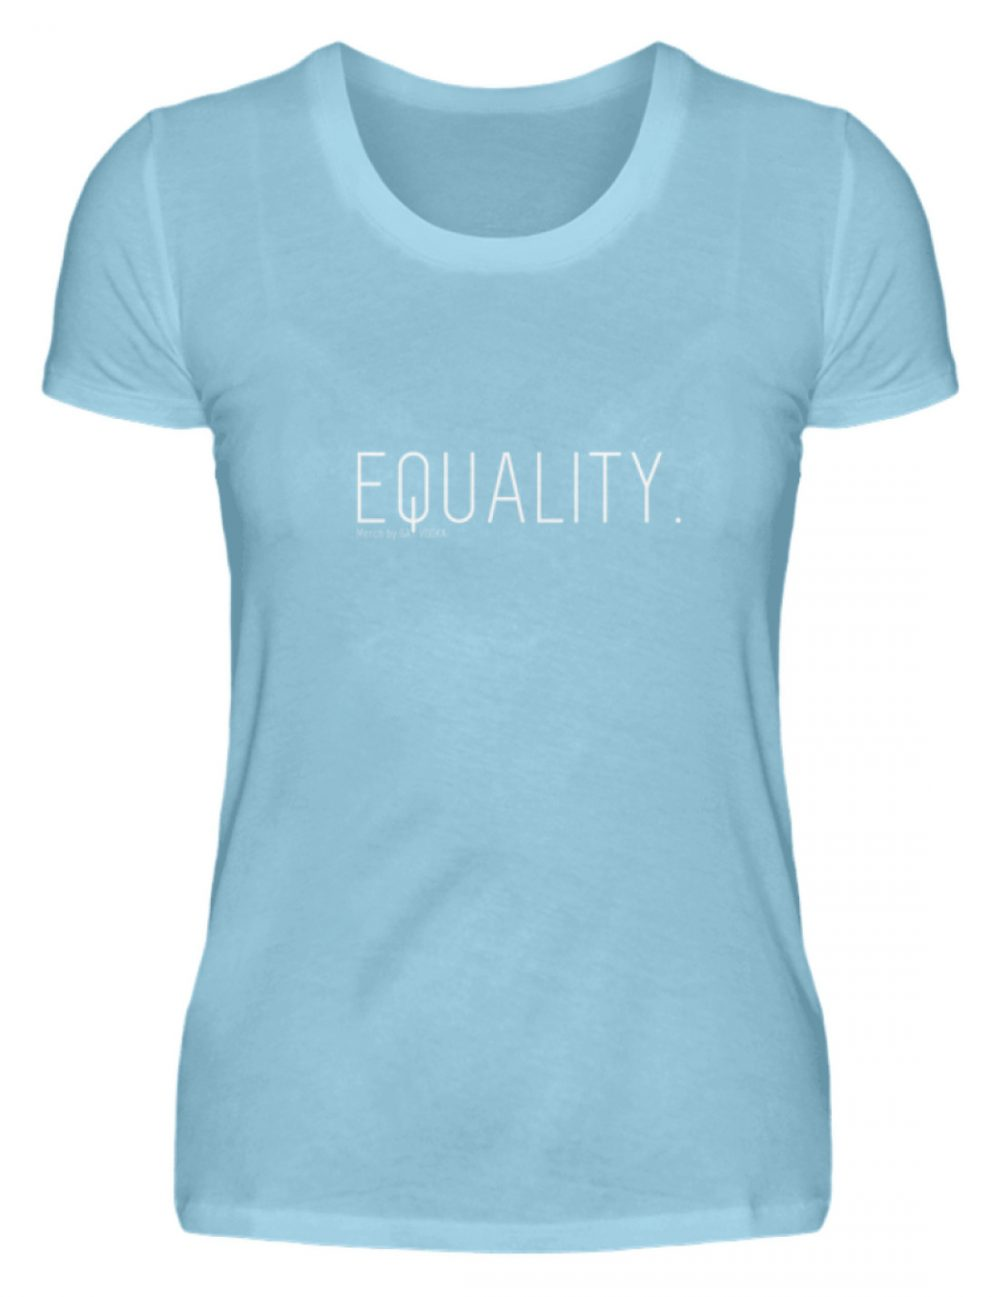 EQUALITY. - Damen Premiumshirt-674